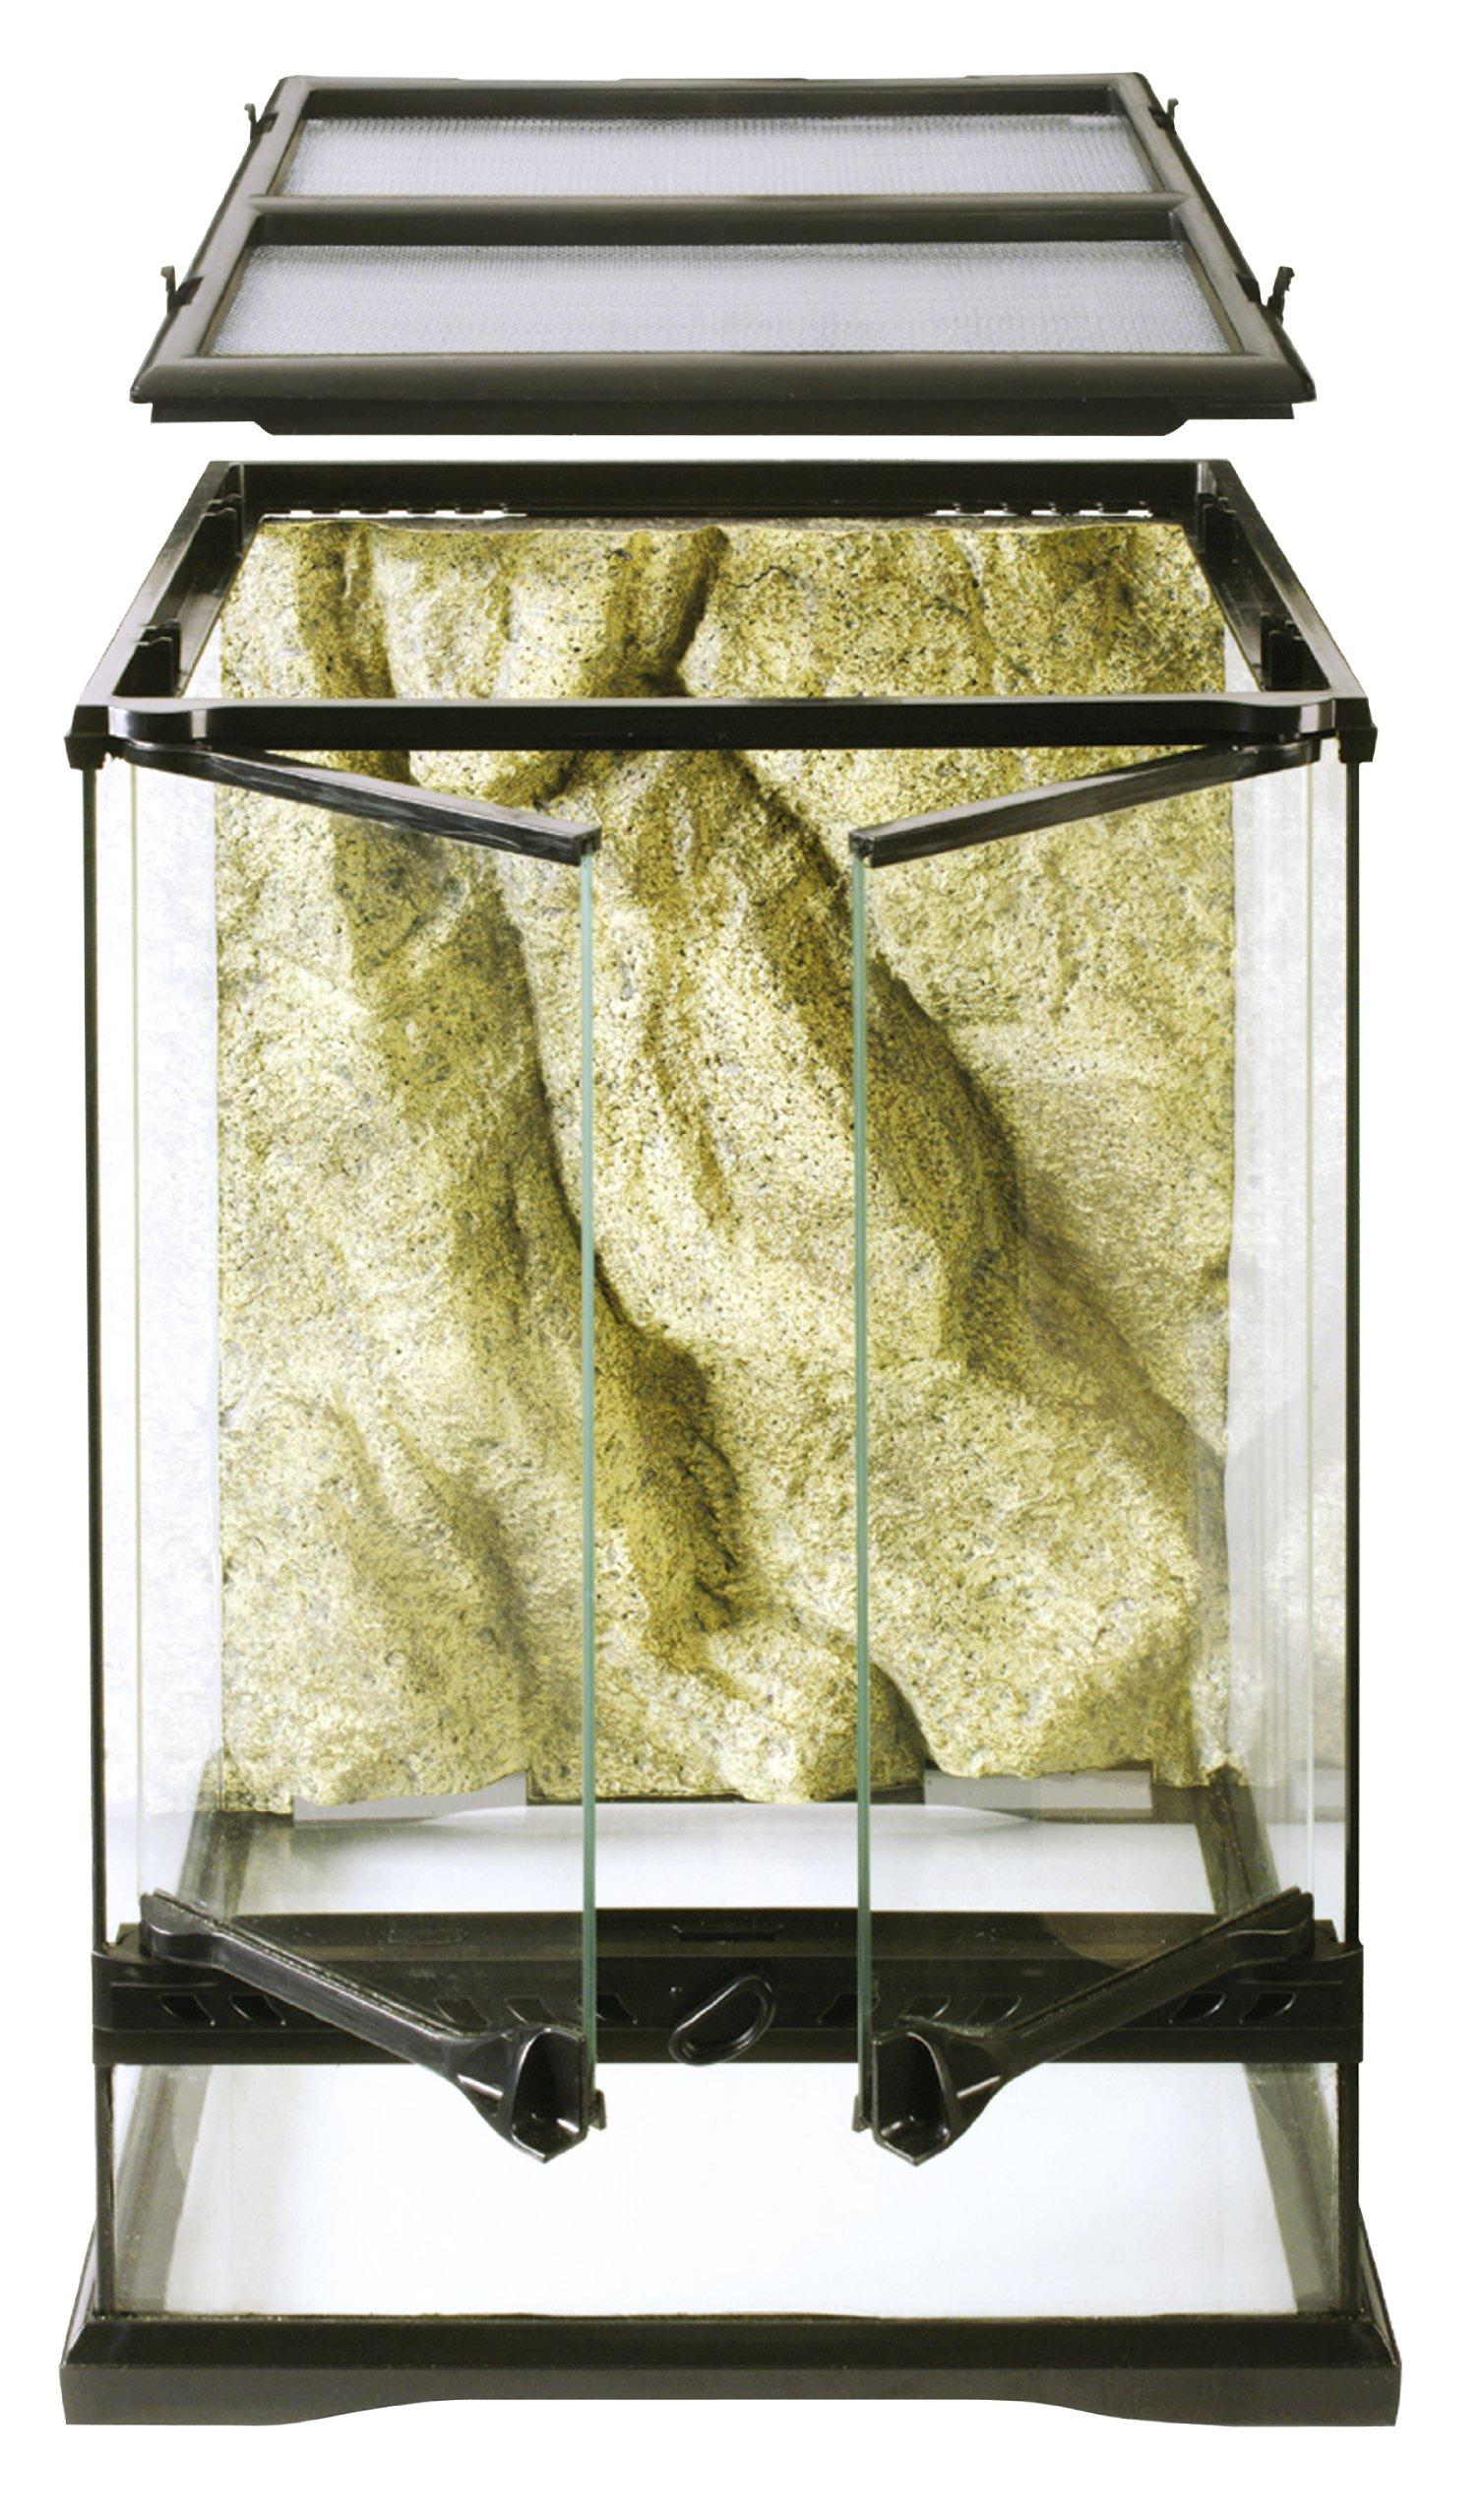 Exo Terra Glass Terrarium, 12 by 12 by 18-Inch by Exo Terra